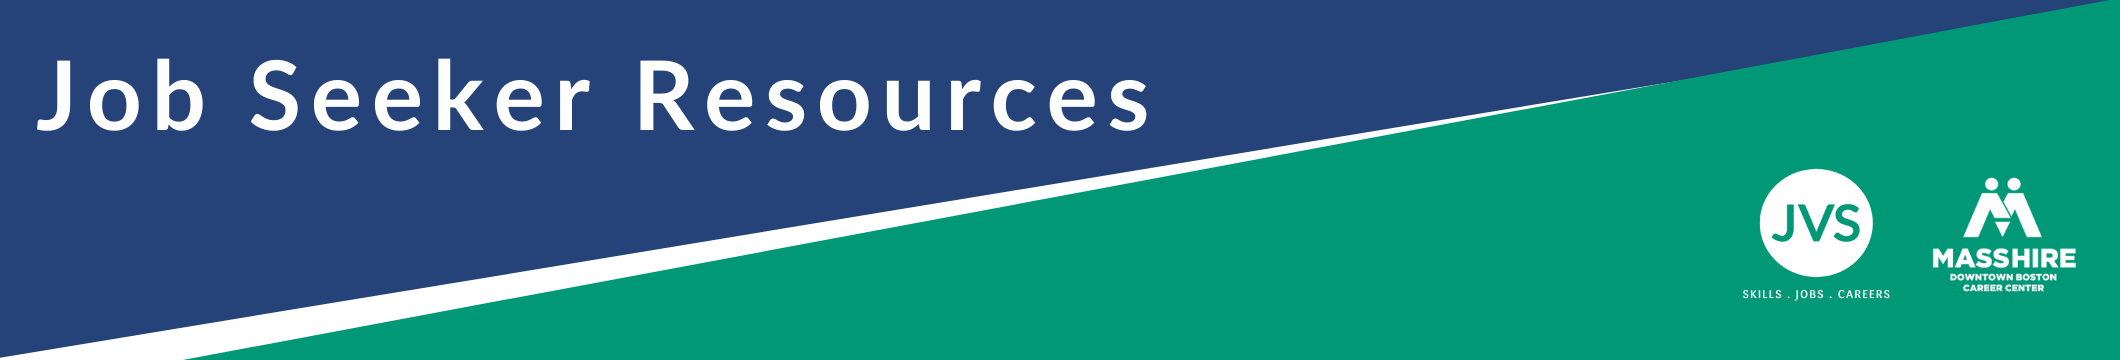 Job Seeker Resources